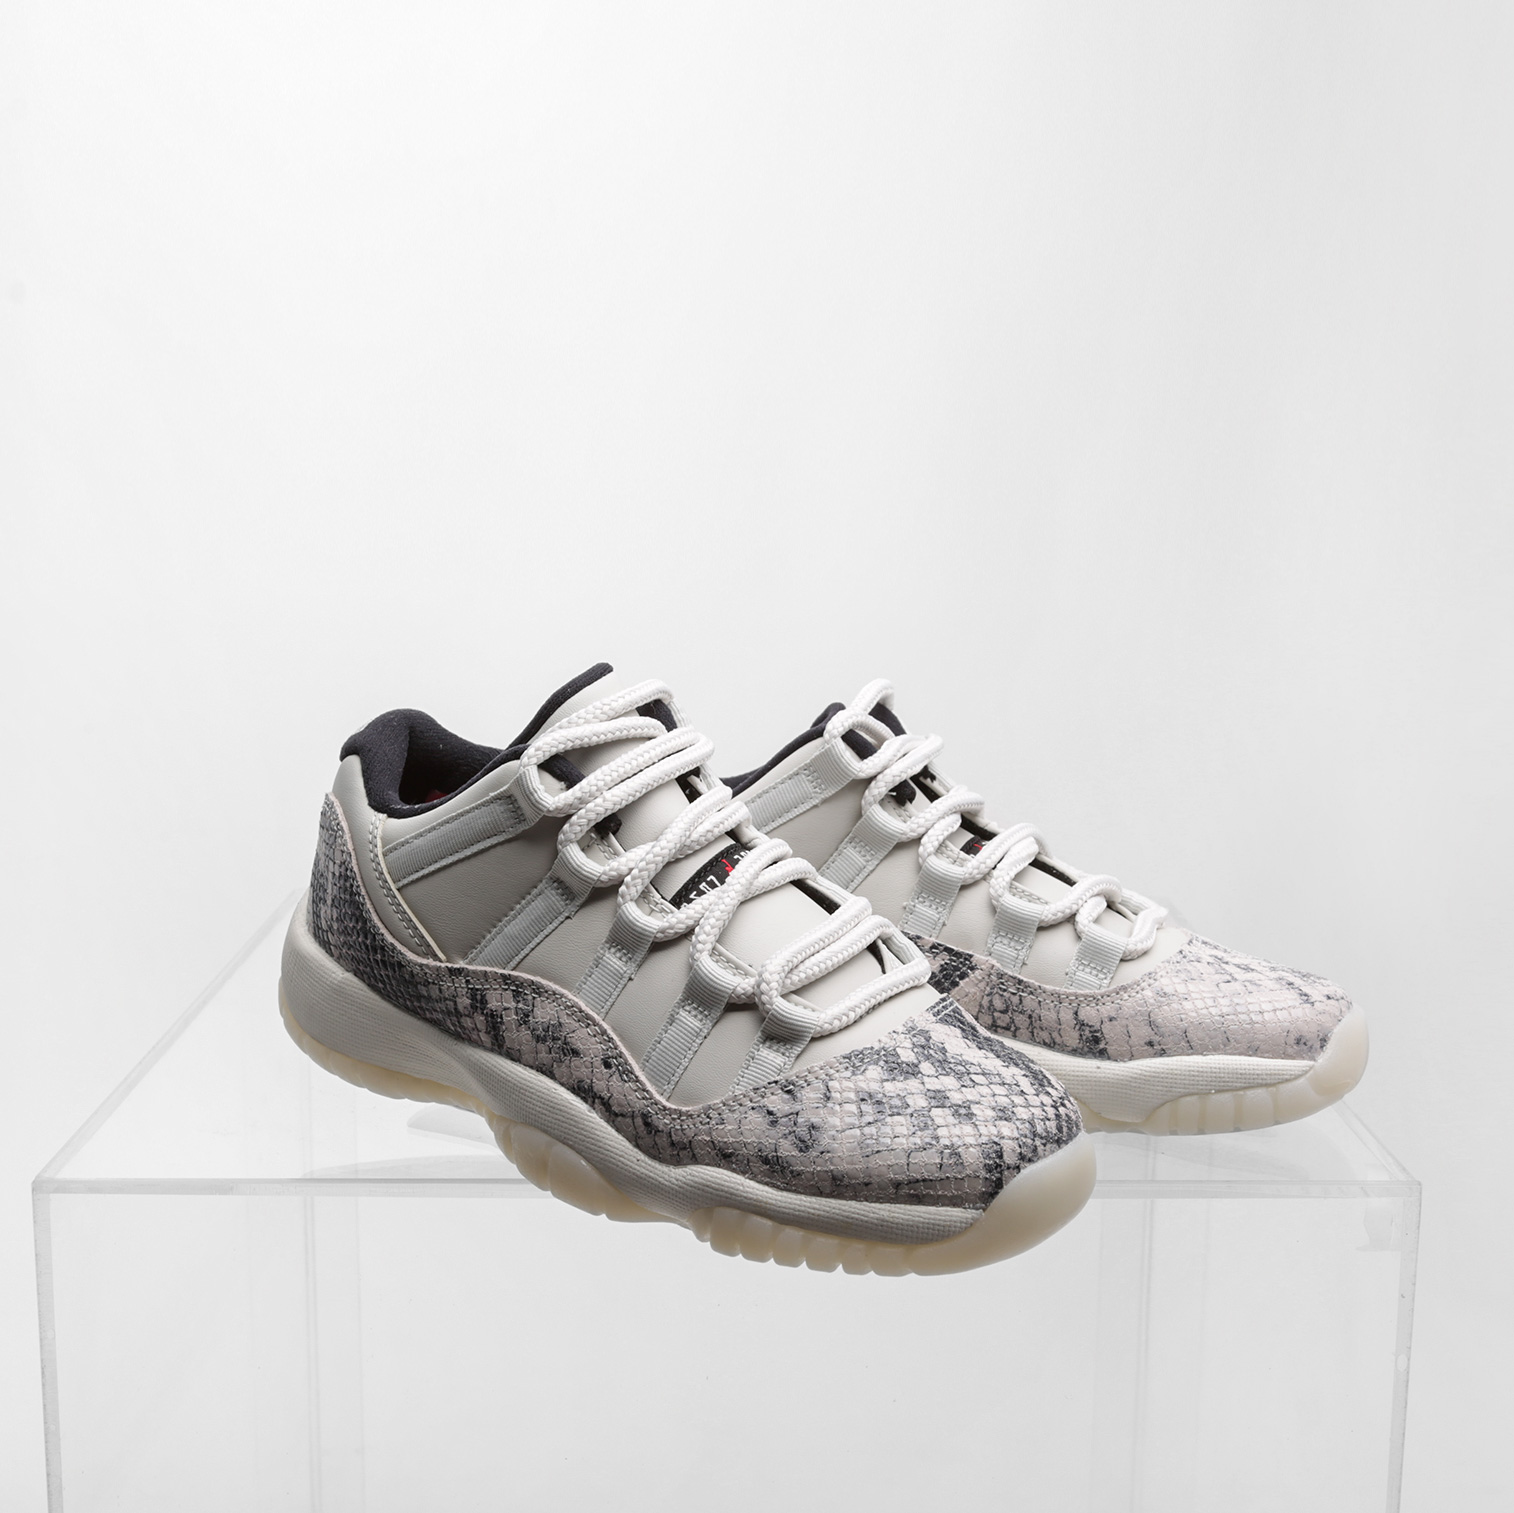 Кроссовки Jordan 11 Retro Low Le